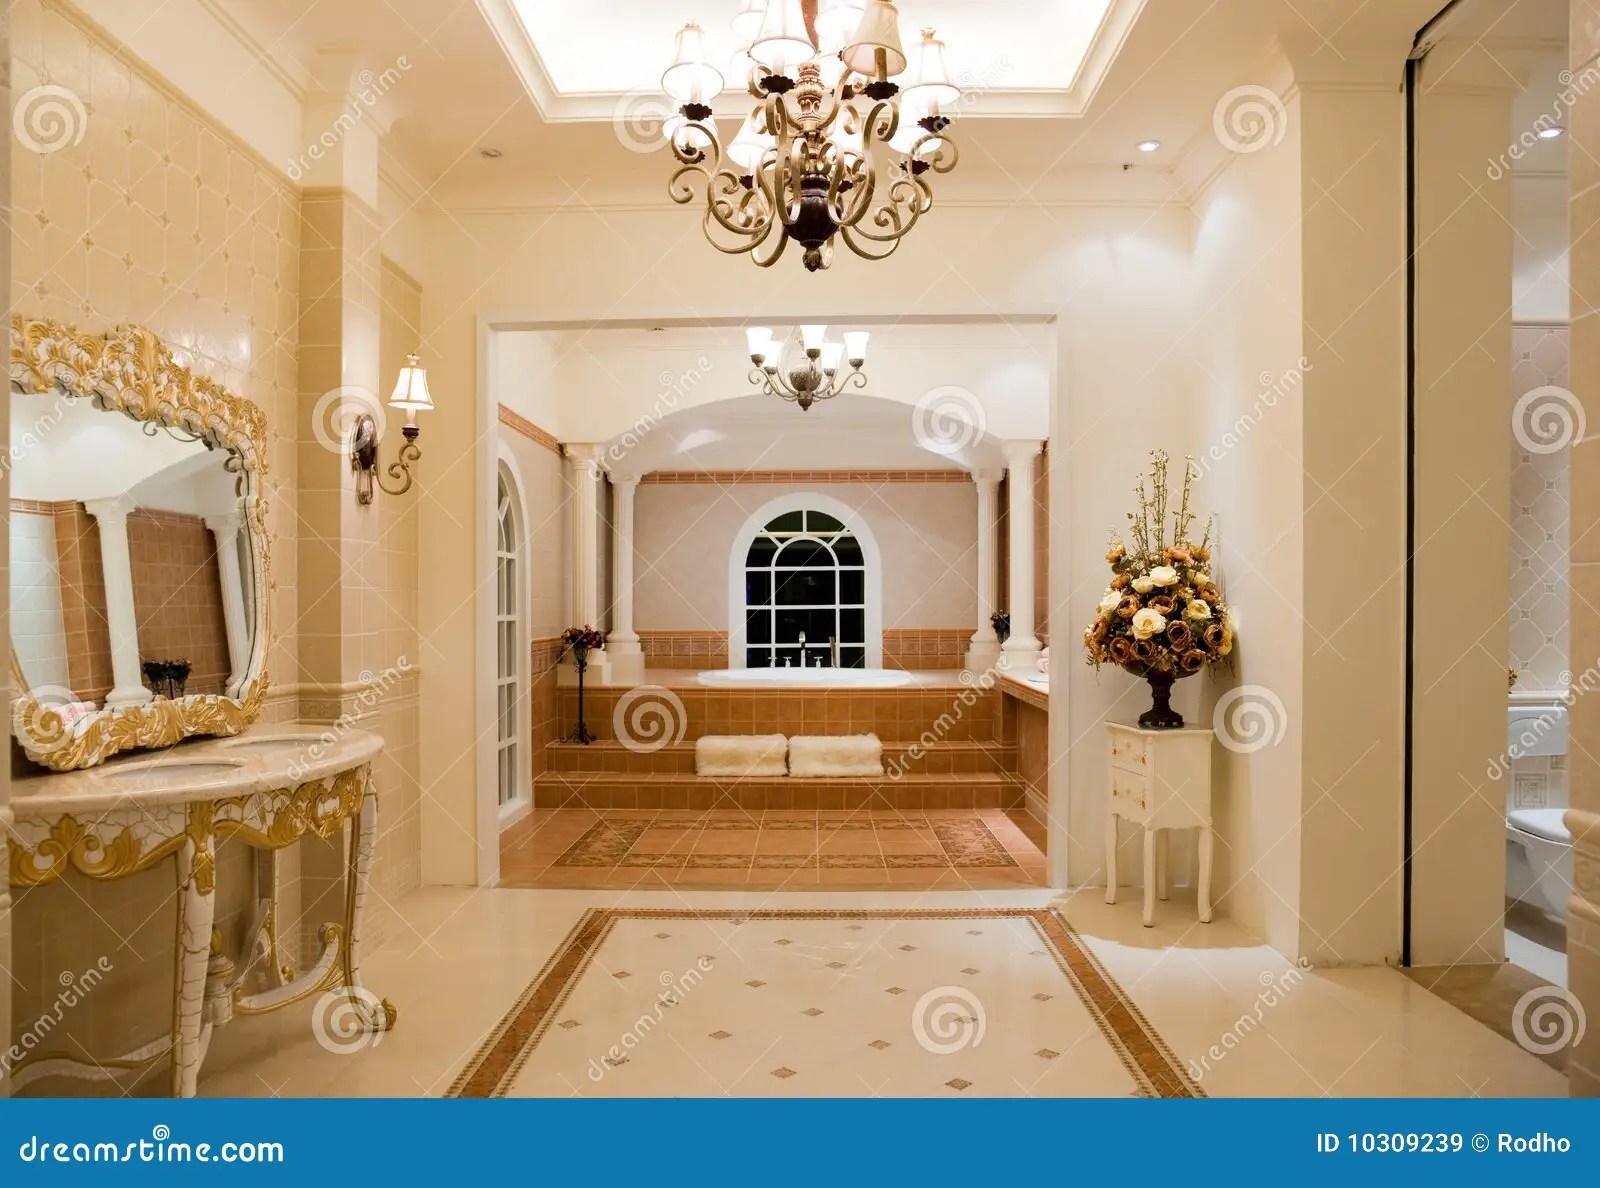 Luxury Master Bathroom Royalty Free Stock Images  Image